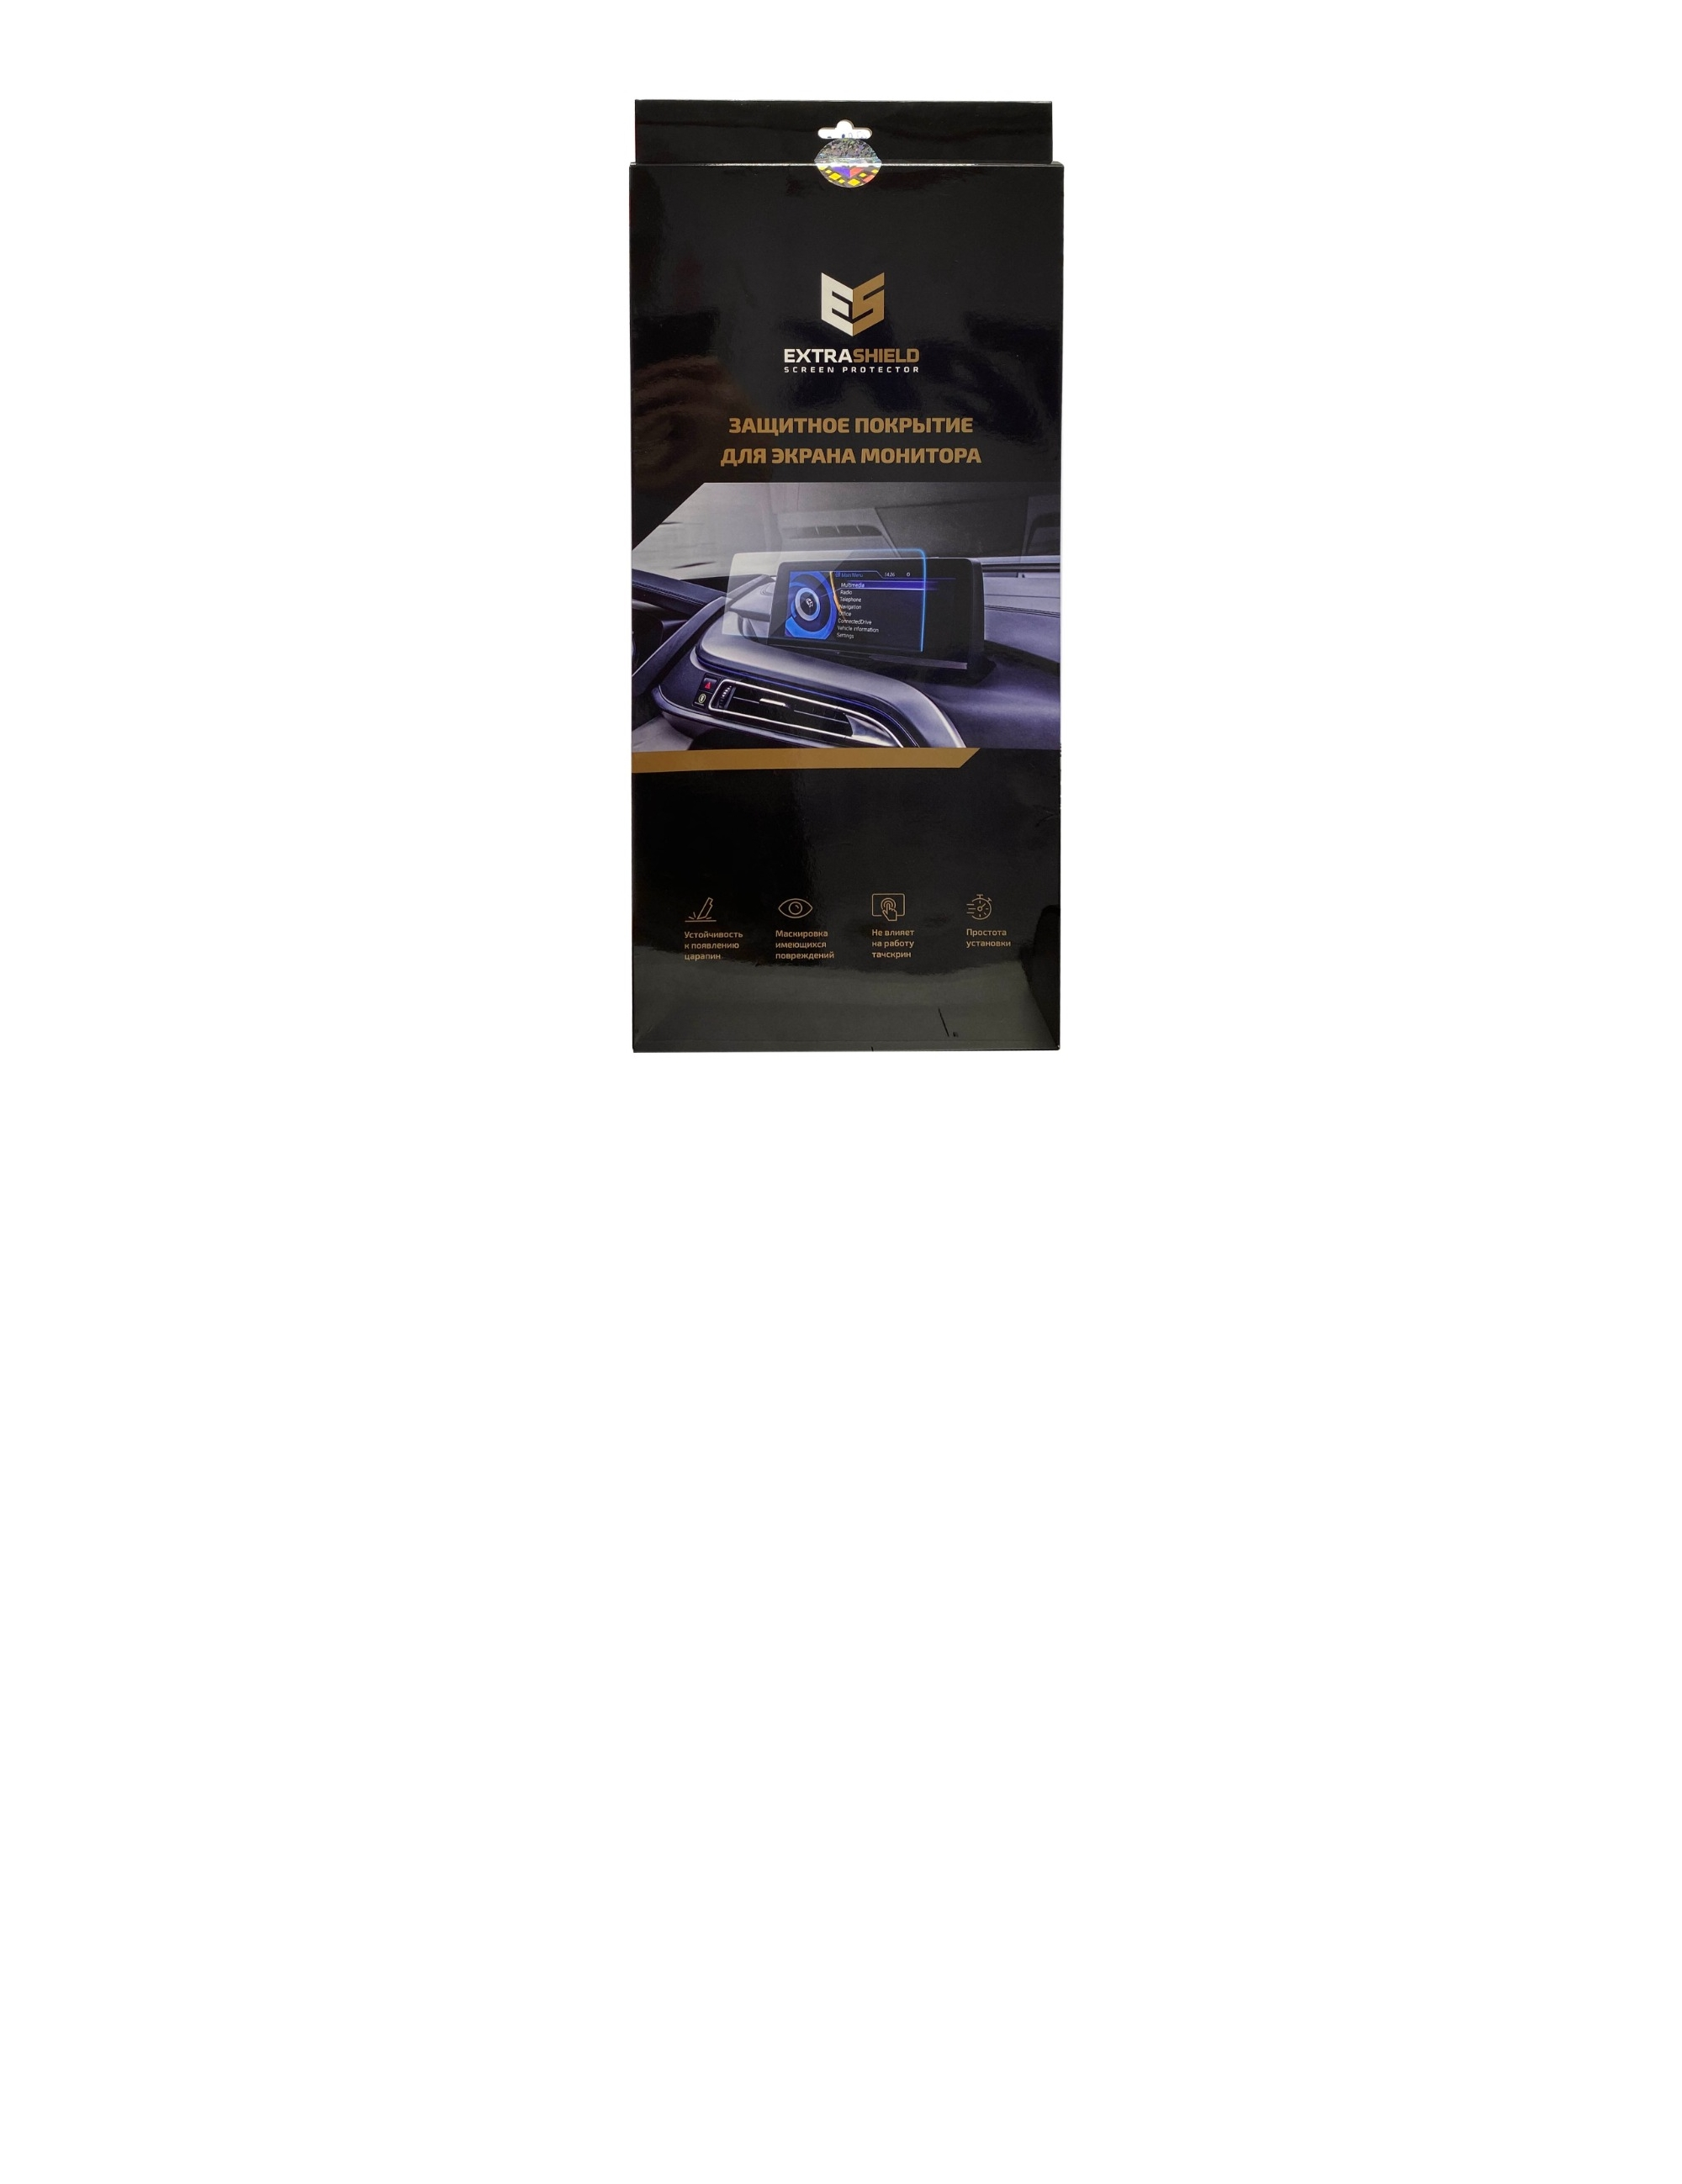 Audi Q5 II (FY) рестайлинг 2019 - н.в. мультимедиа MMI 8.3 Защитное стекло Глянец